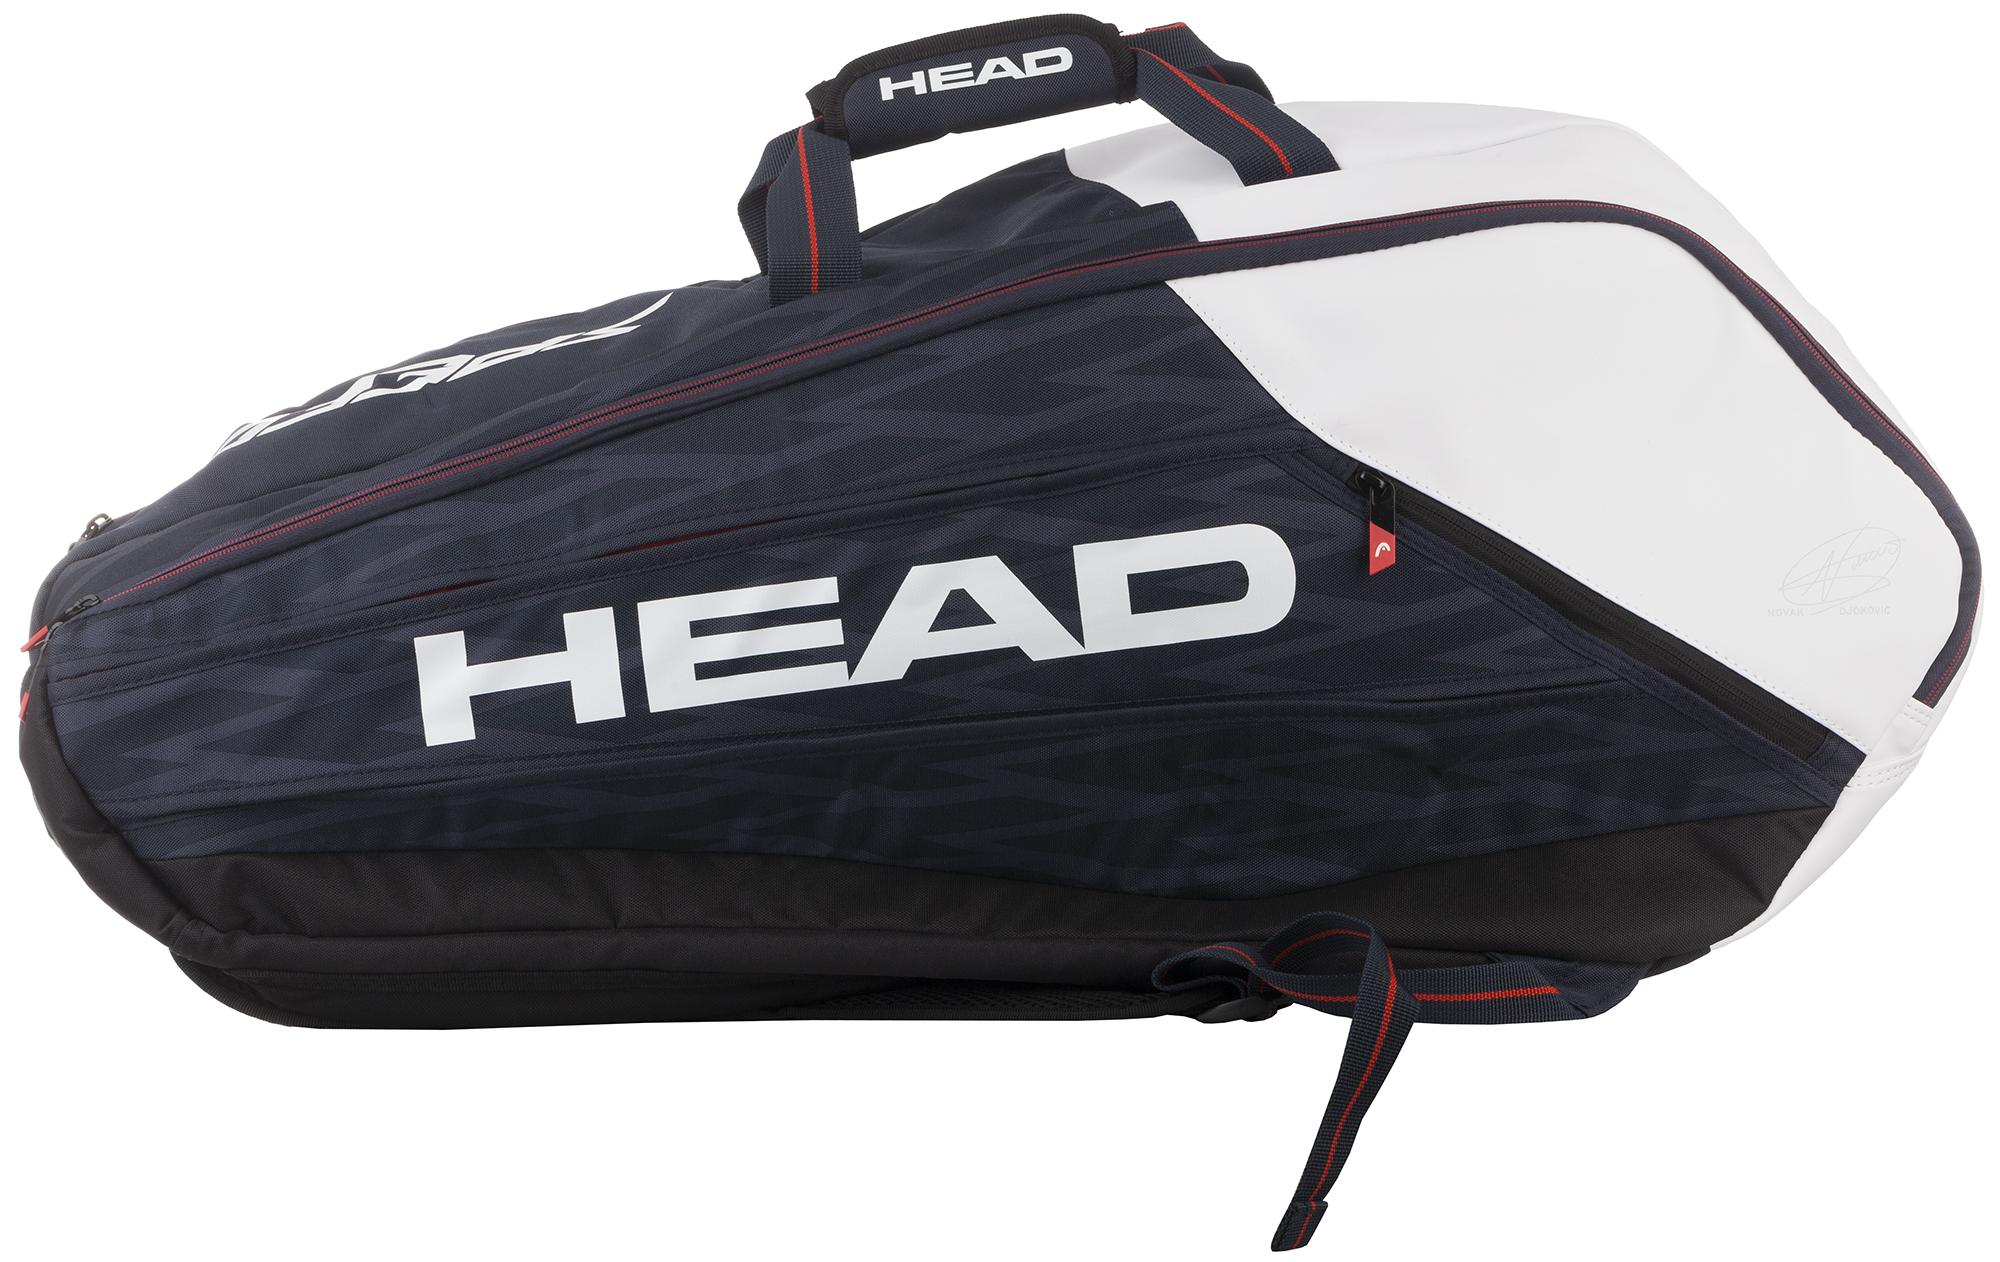 Head Сумка для 9 ракеток Head Djokovic head сумка head tour team 6r combi